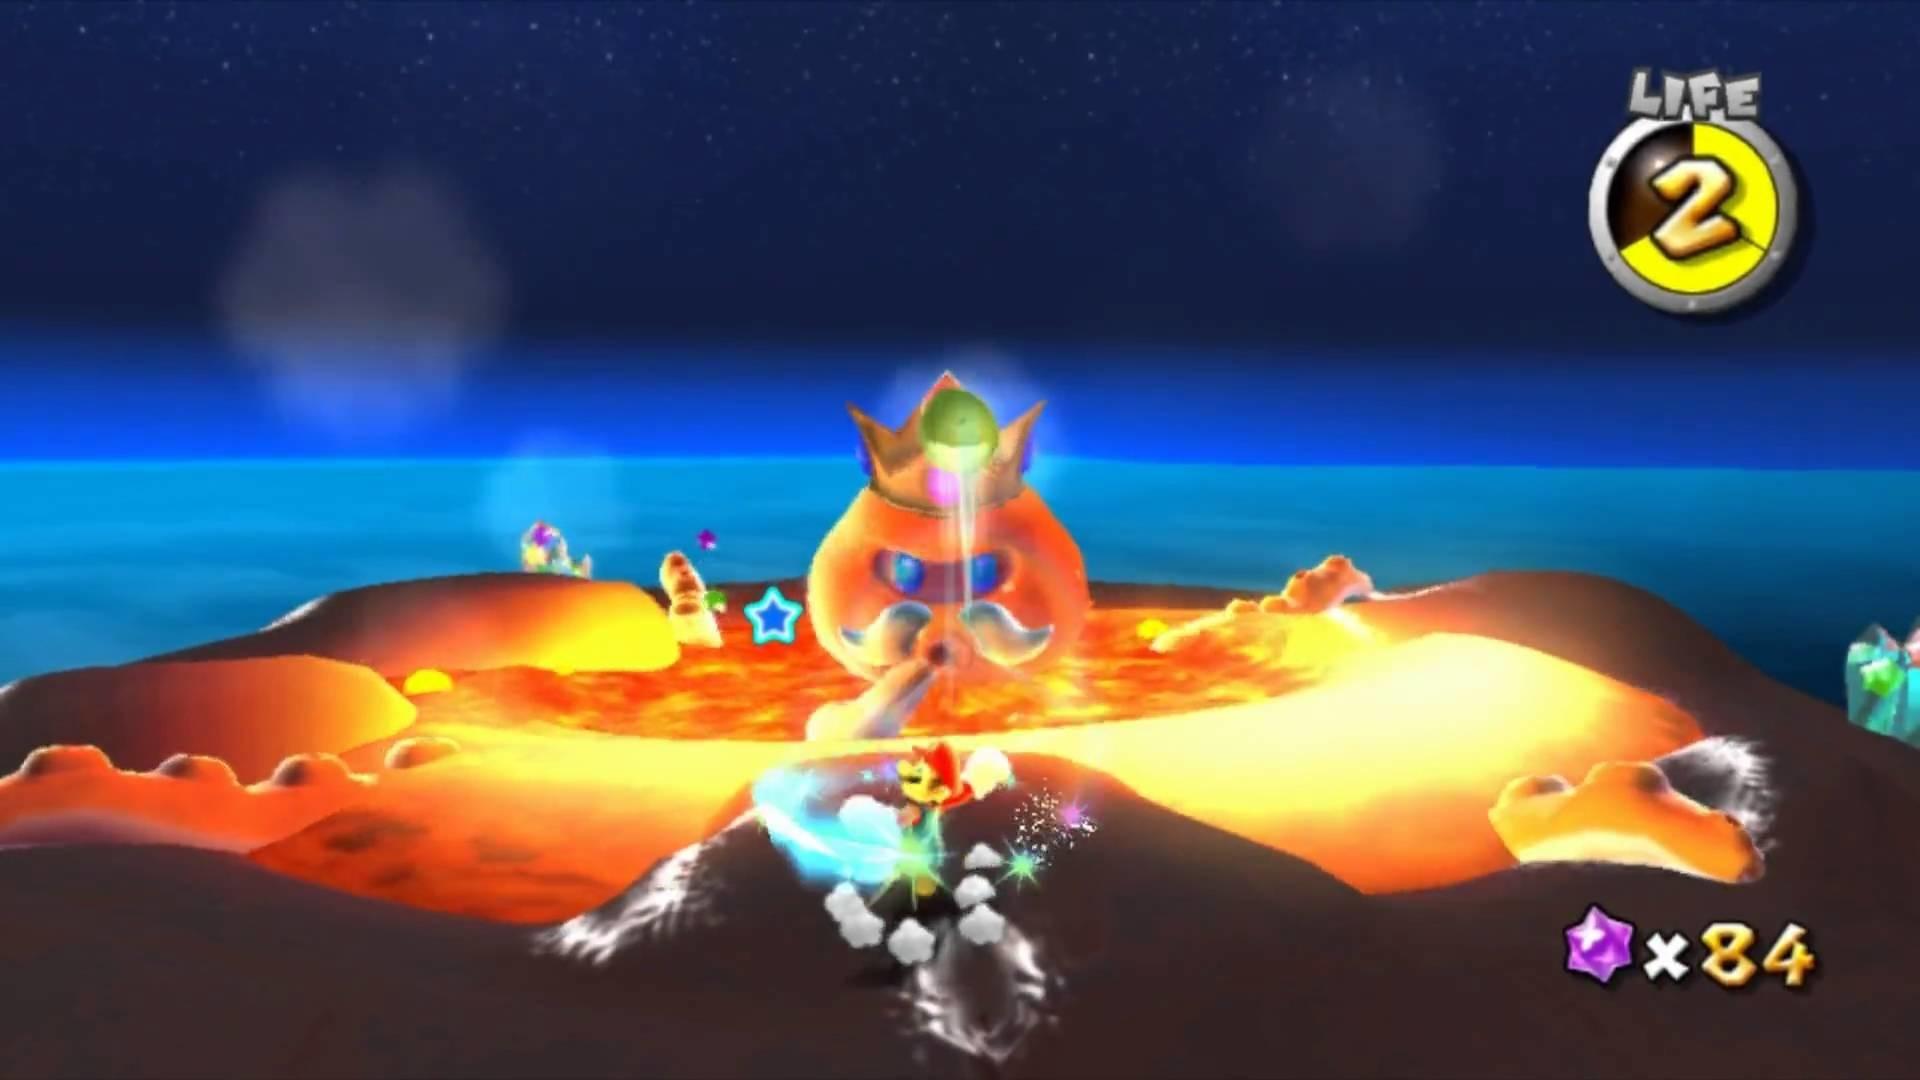 Super Mario Galaxy 2 Wallpaper HD (77+ pictures)